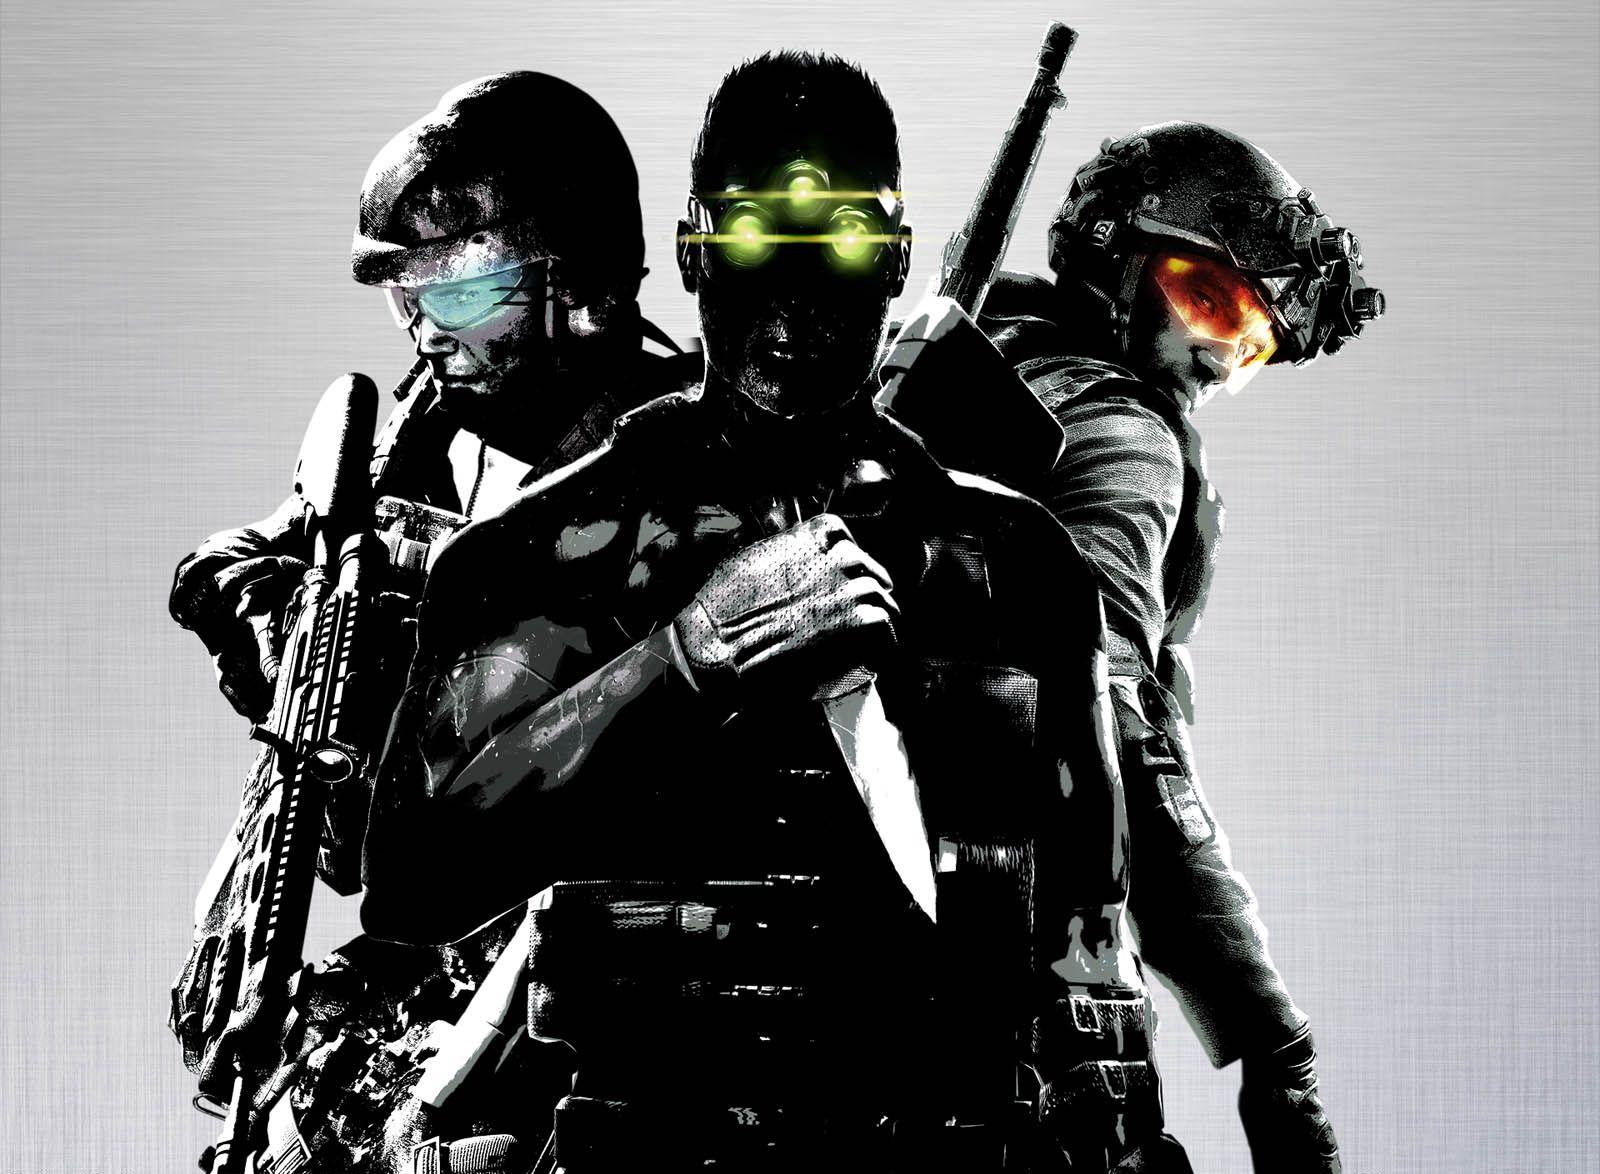 Rainbow Six Siege Patriot Wallpaper: Tom Clancys Rainbow Six Siege Wallpapers HD Wallpapers